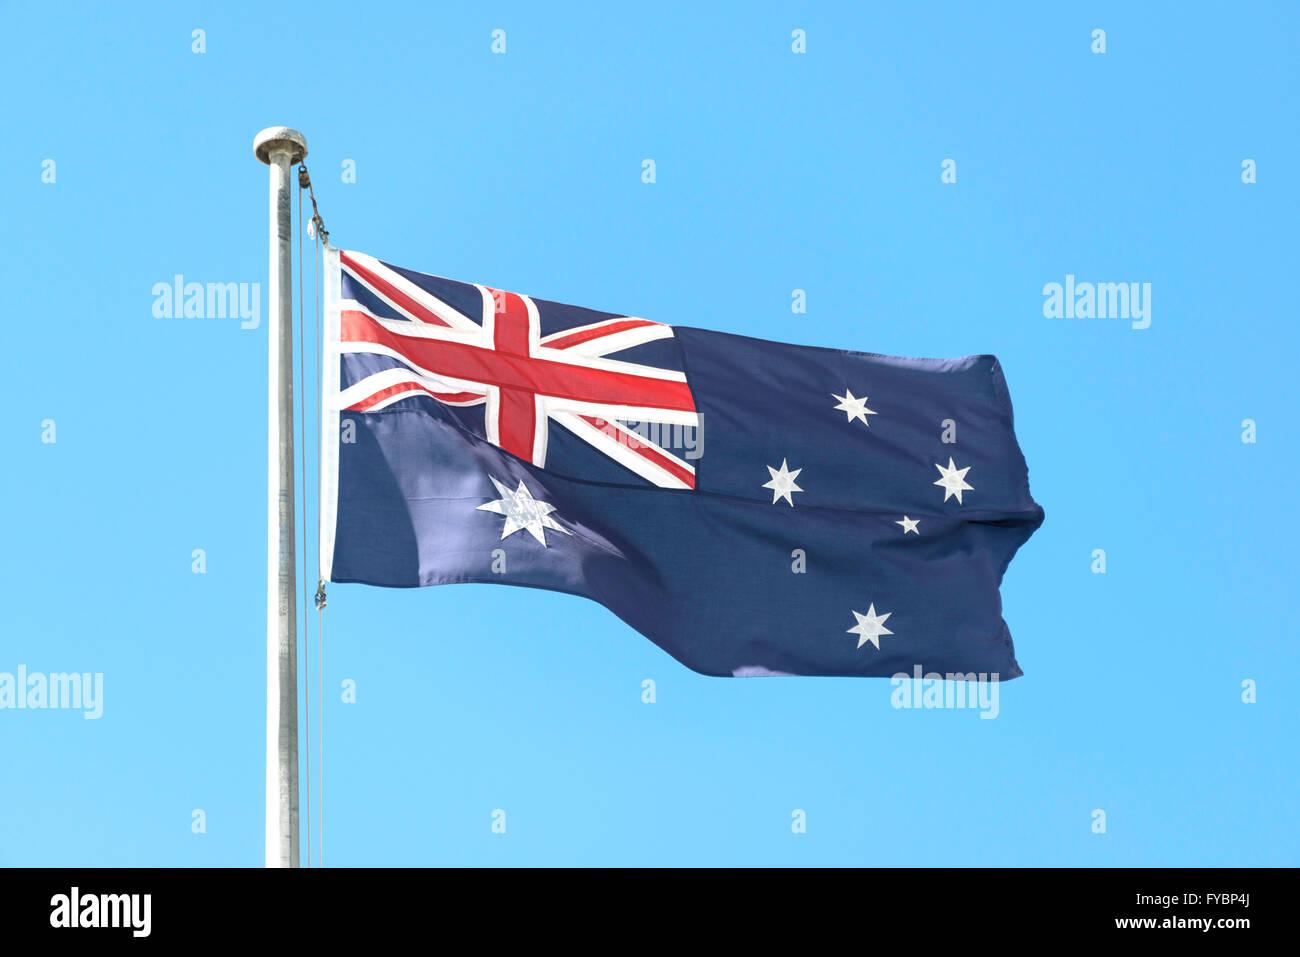 Australian flag flying on flagpole, Sydney Kingsford Smith Airport, Mascot, Sydney, New South Wales, Australia - Stock Image